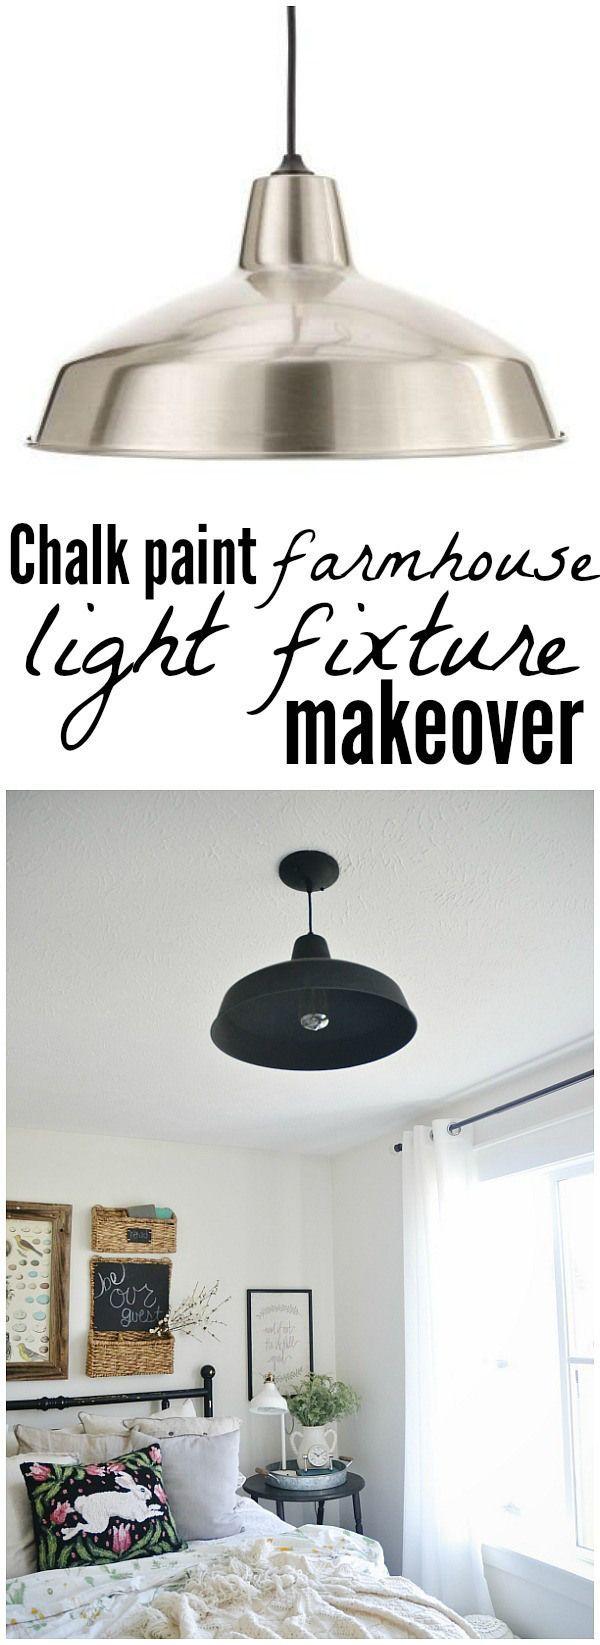 chalk paint farmhouse light fixture this is the perfect guest bedroom - Farmhouse Light Fixtures